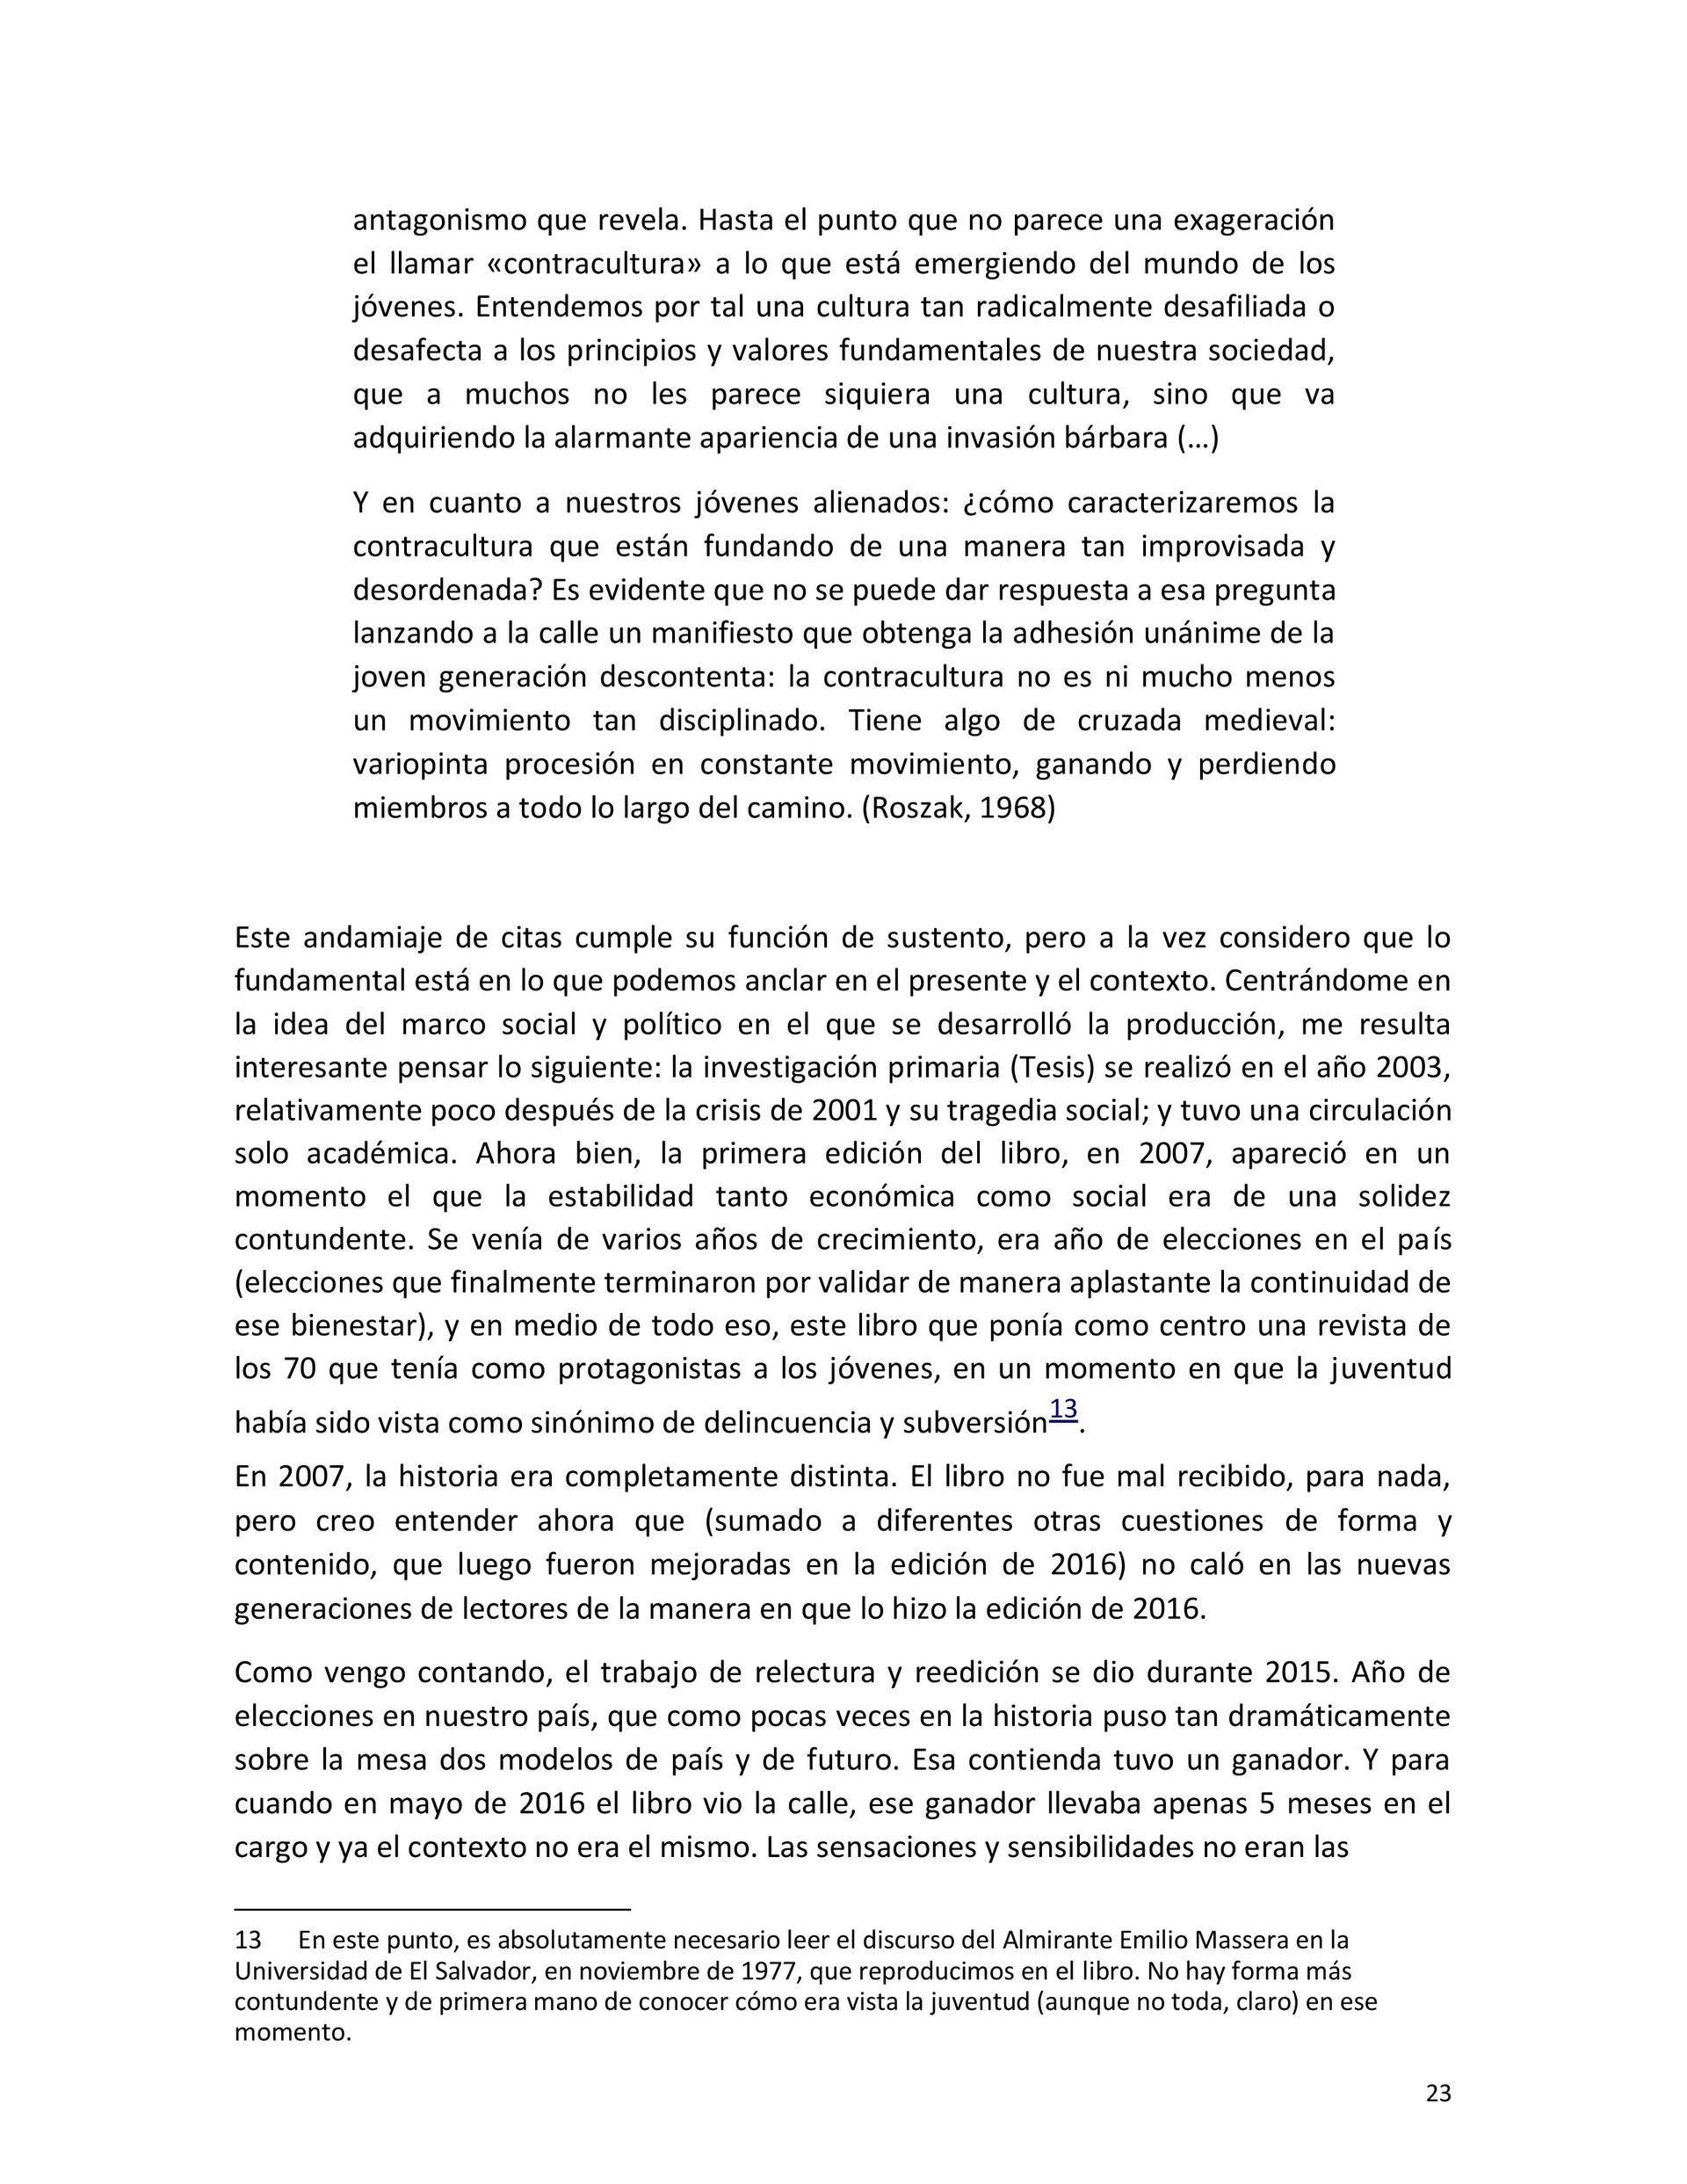 estacion_Page_22.jpeg